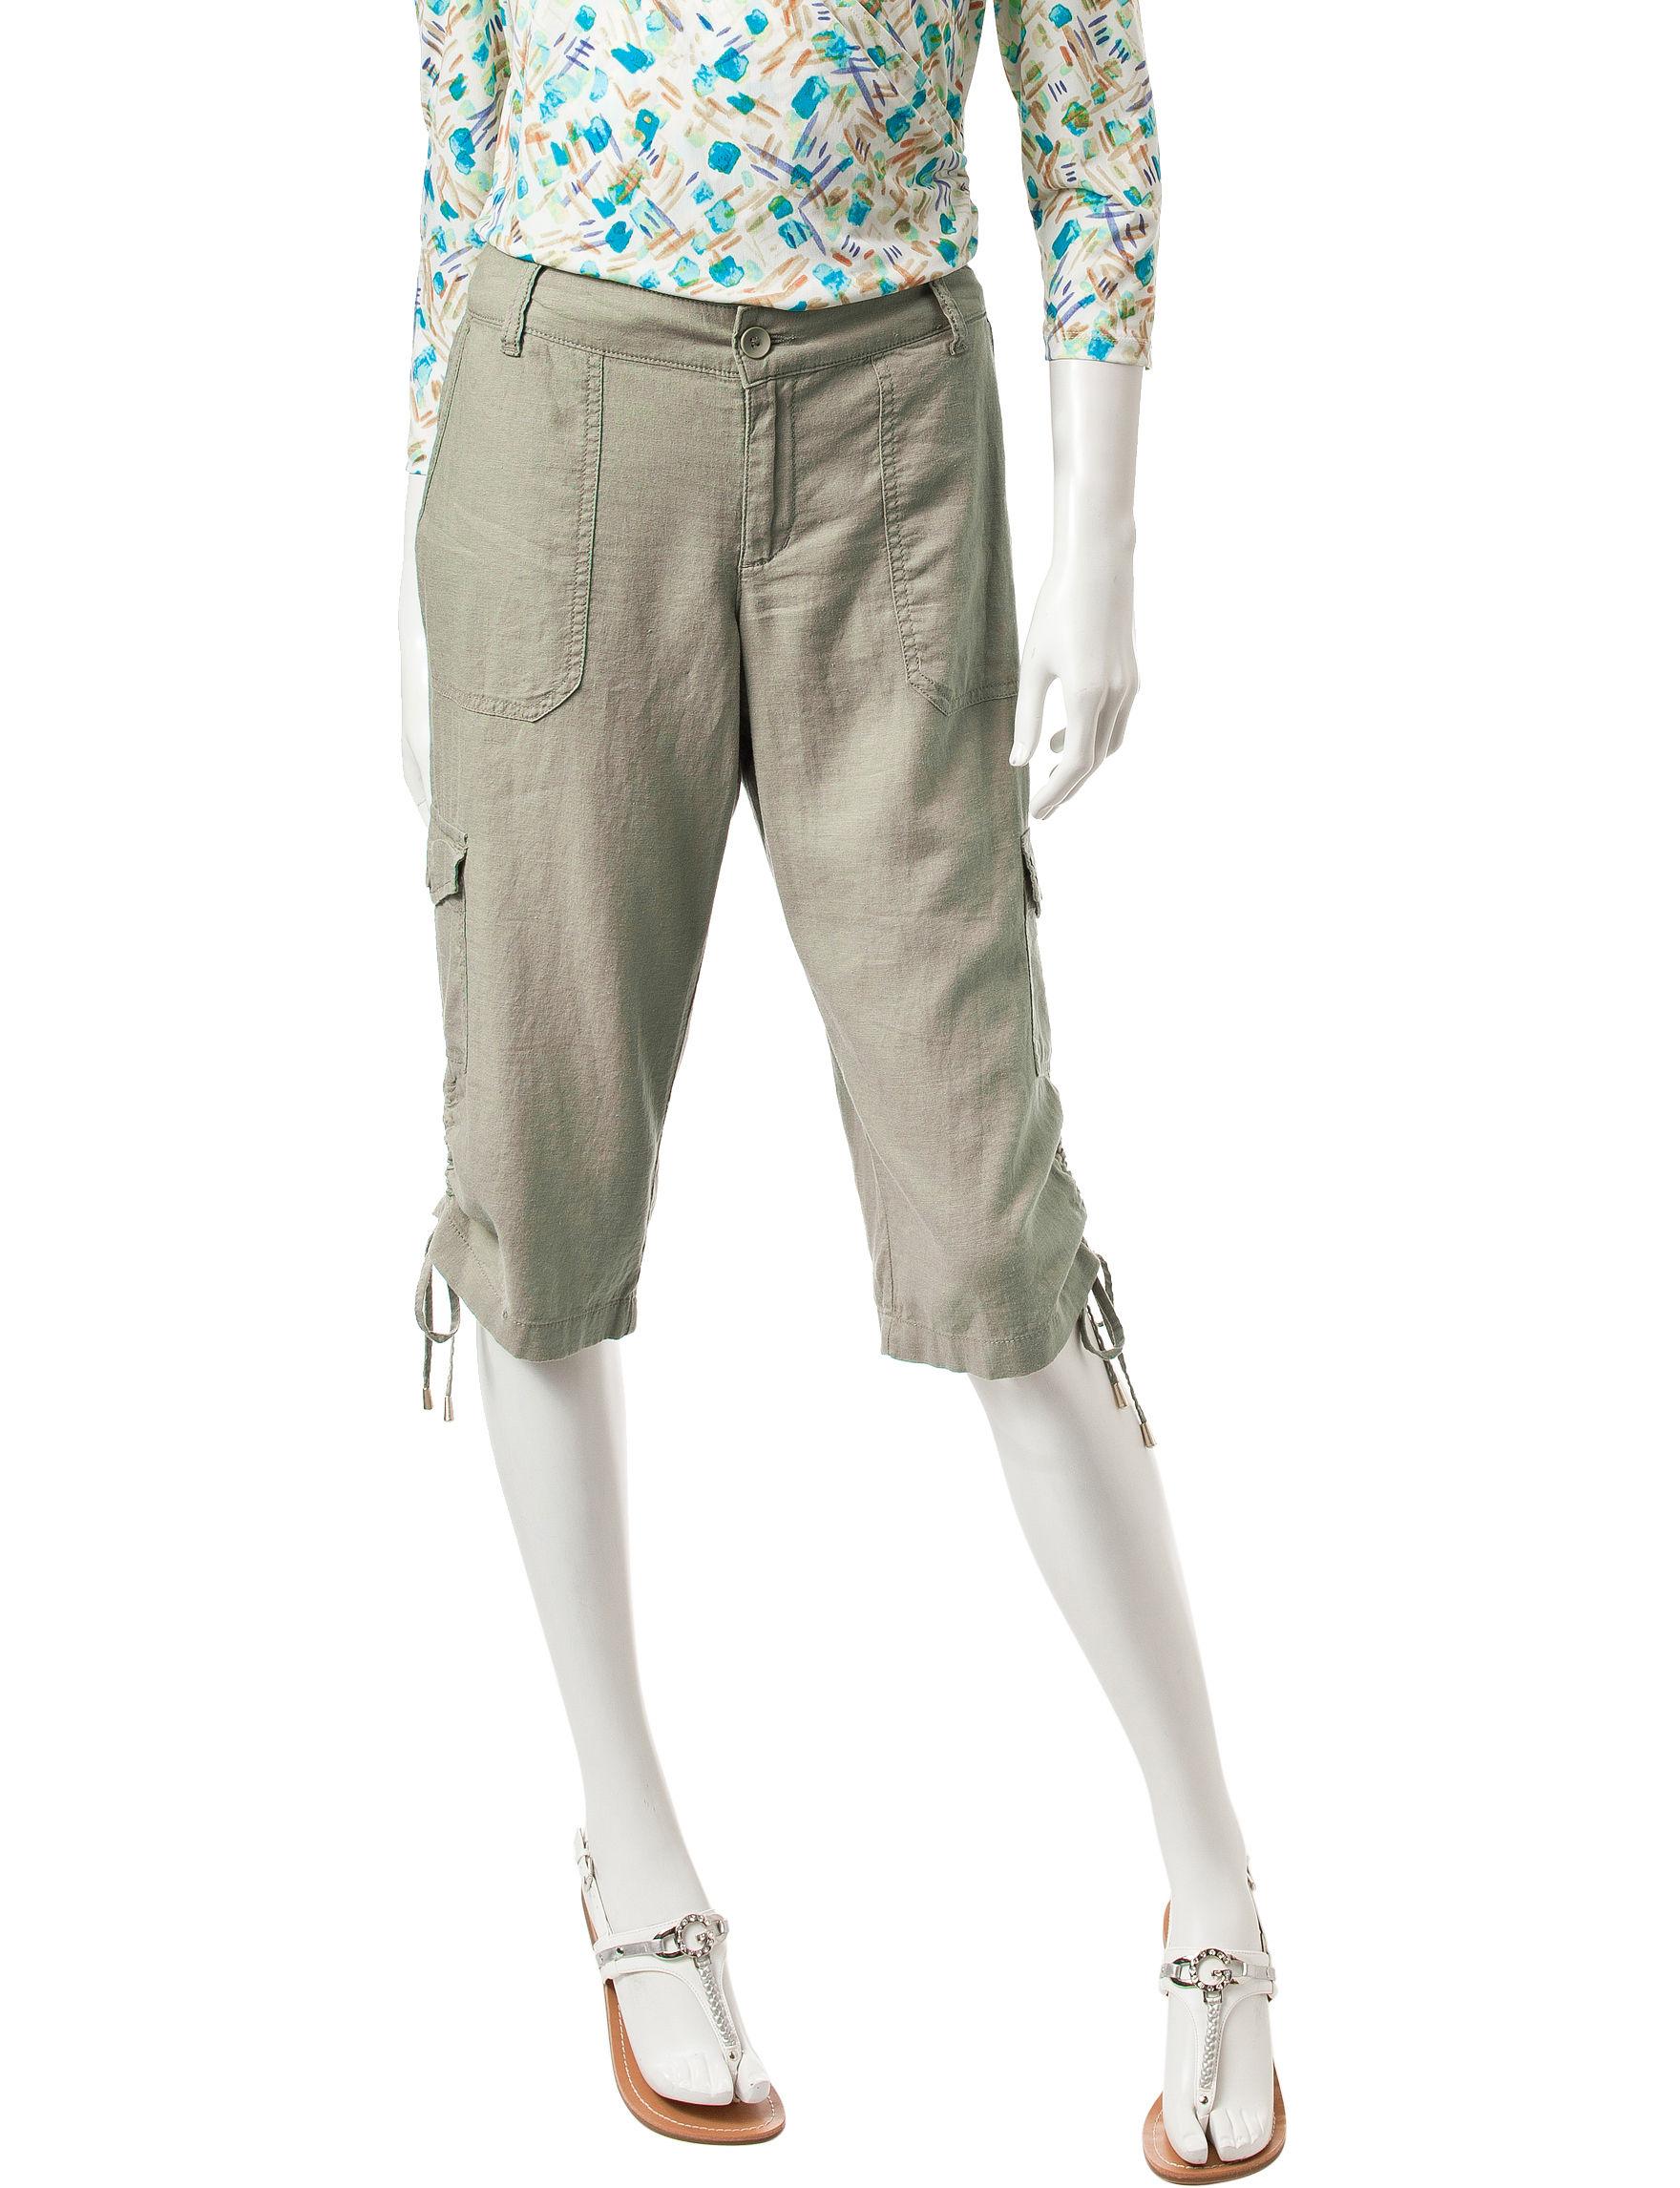 Nine West Jeans Beige Capris & Crops